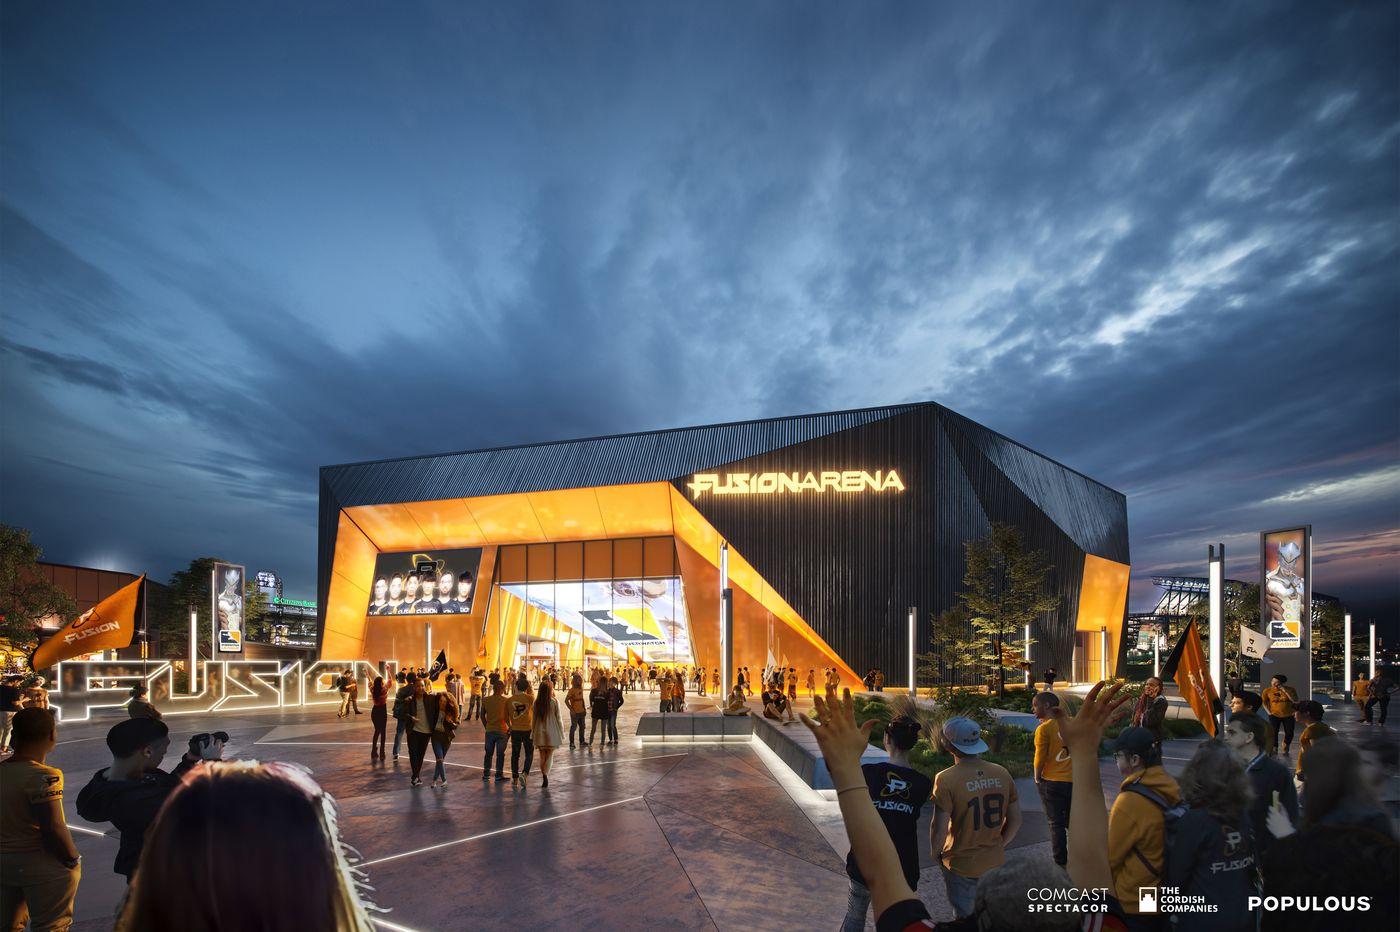 vice.com - Matthew Gault - Comcast Is Building a $50 Million Esports Stadium in Philadelphia